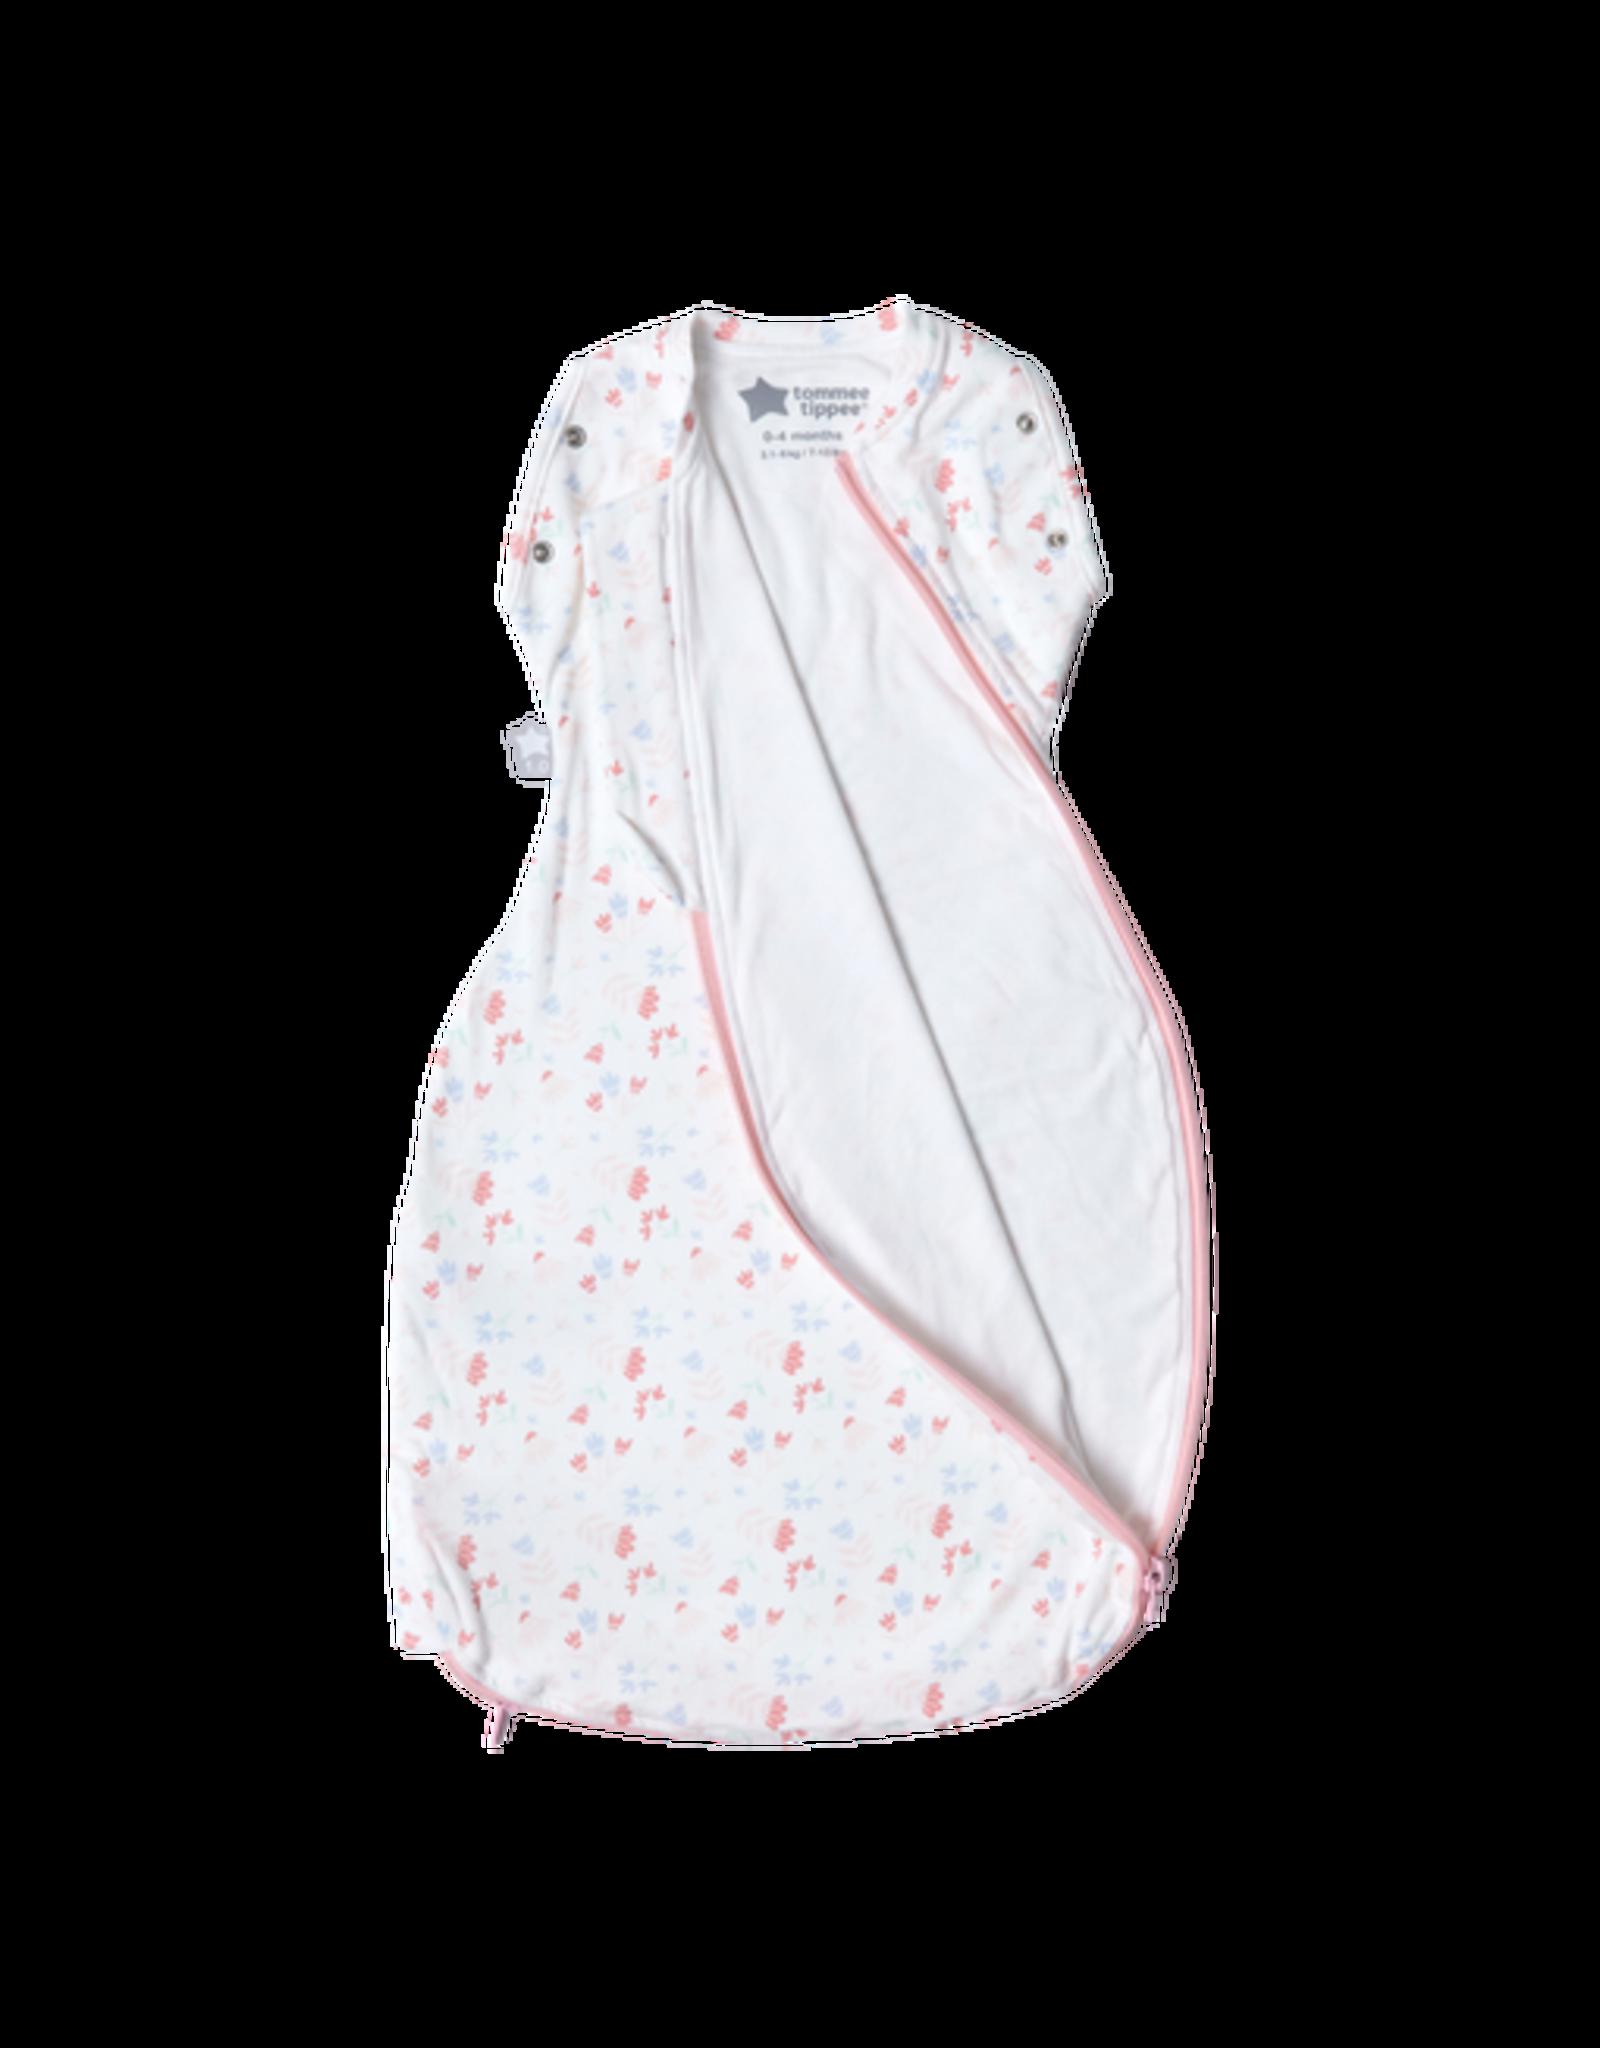 Gro Company Snuggle Gro Snug - 1 Tog  - 0-4 months